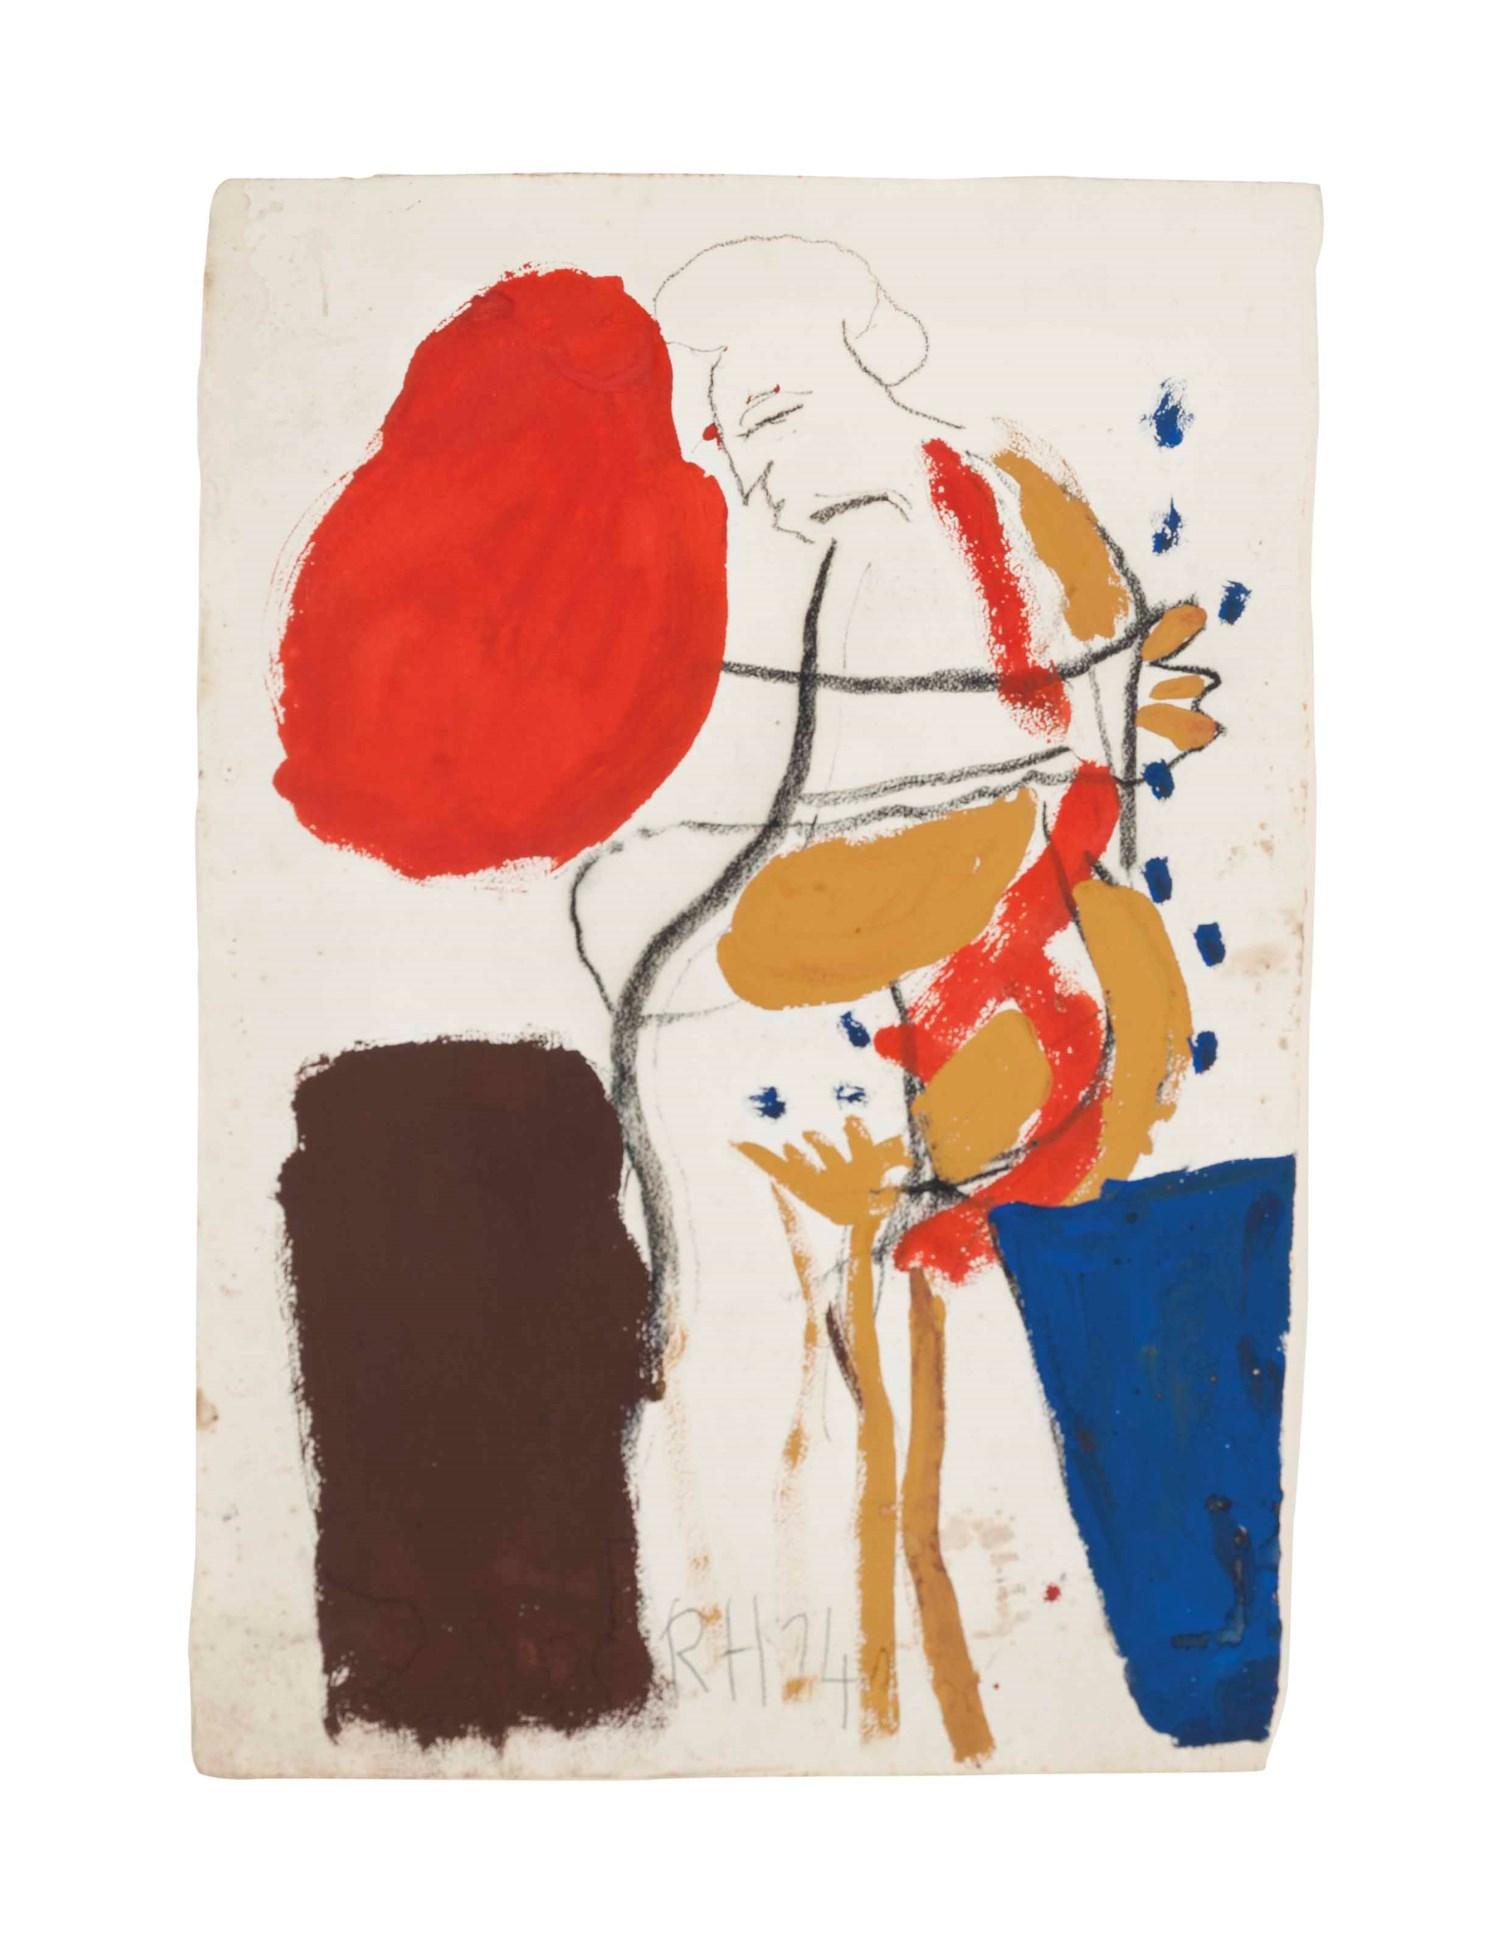 Bonhams : Roger Hilton (British, 1911-1975) Landscape 36.5